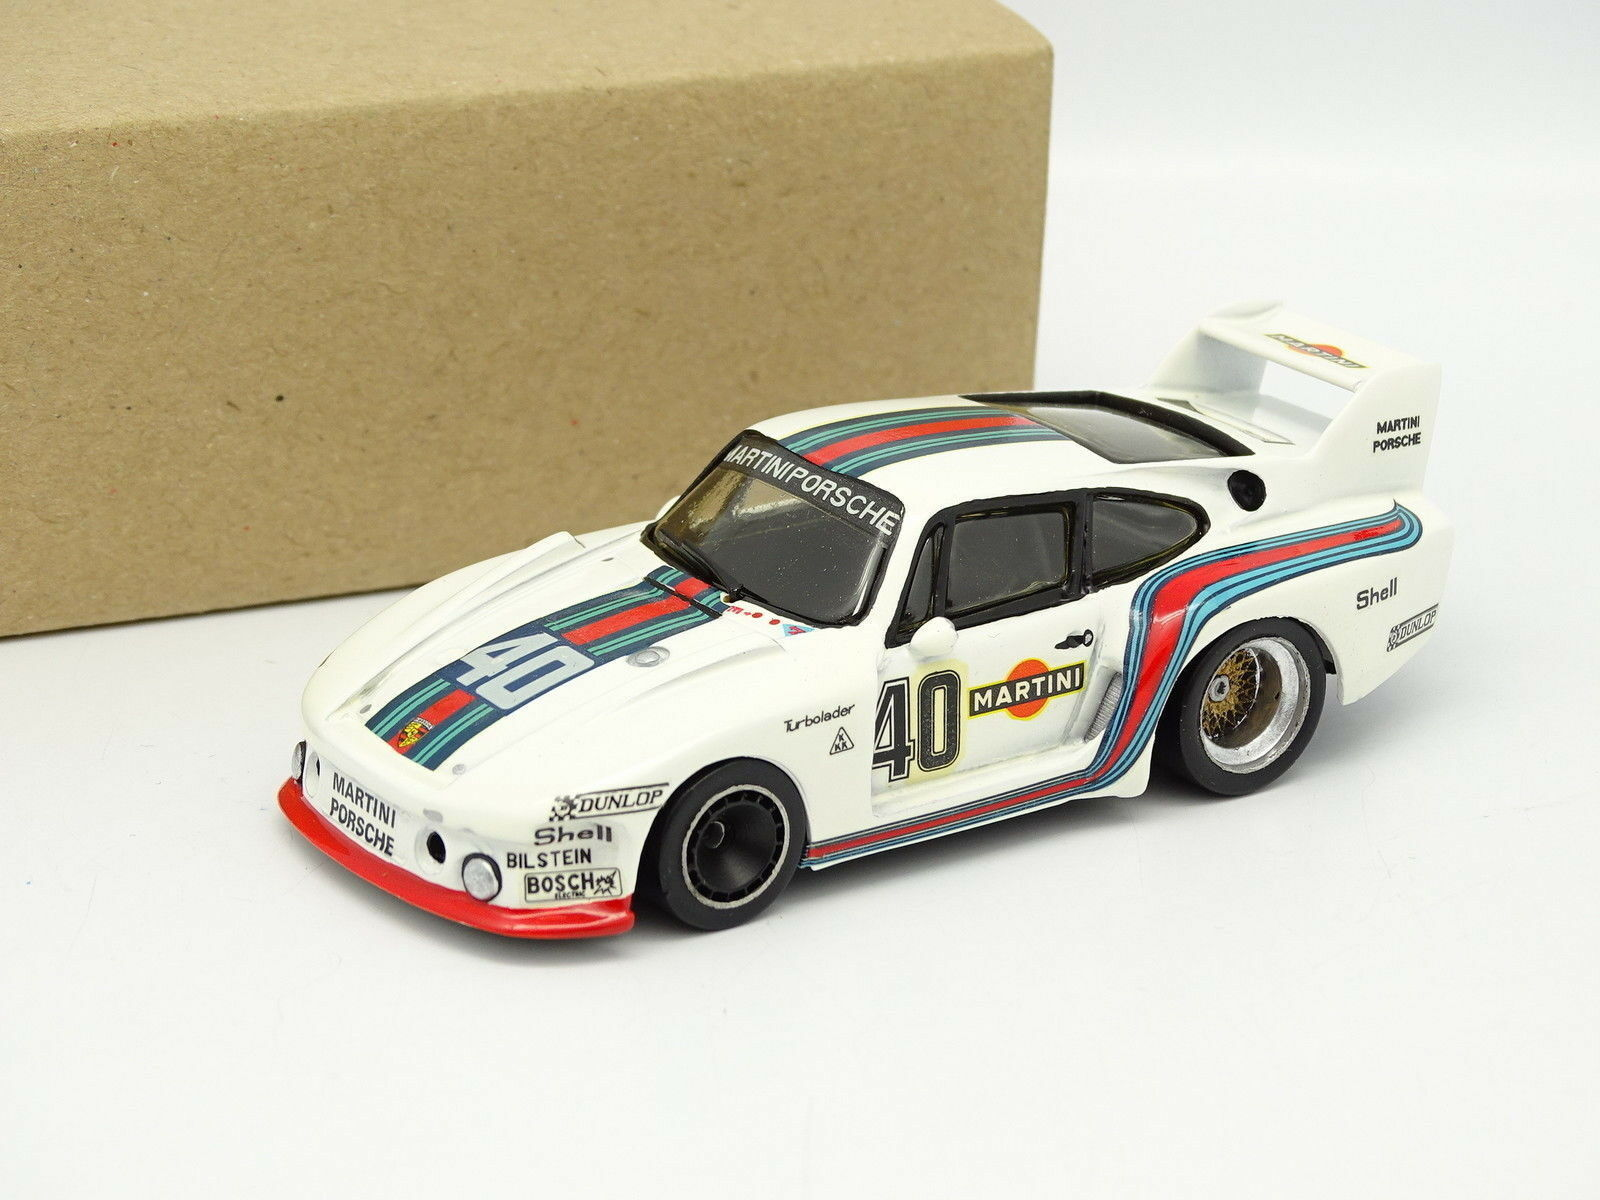 Oeste Minichamps Kit Montado Metal 1 43 - Porsche 935  2 Martini Hockenheim 1977